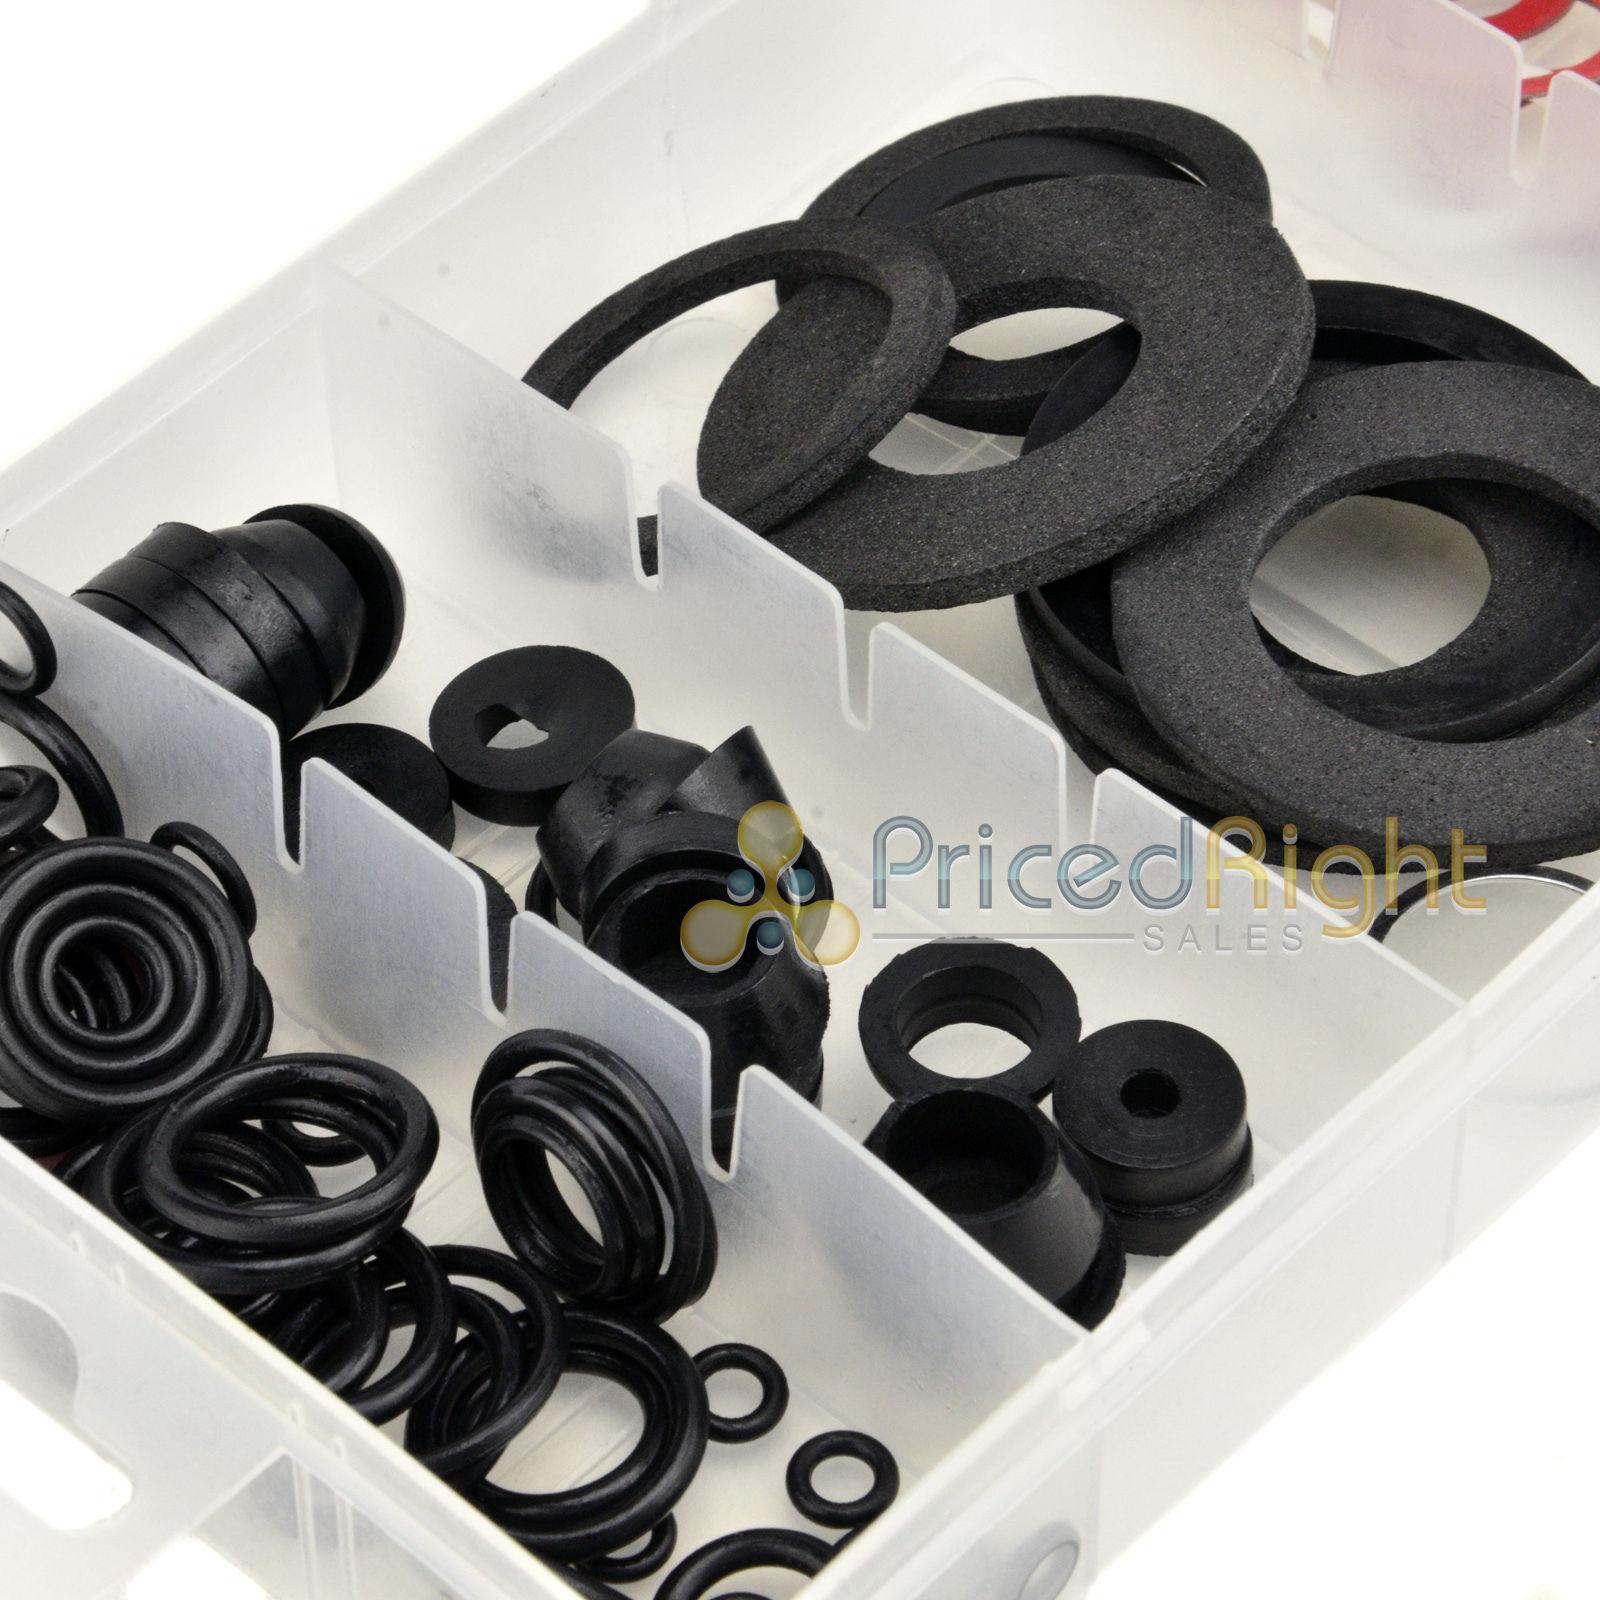 125 Pc Faucet Washer Assortment Set Rubber Fiber Seal Klingerite ...